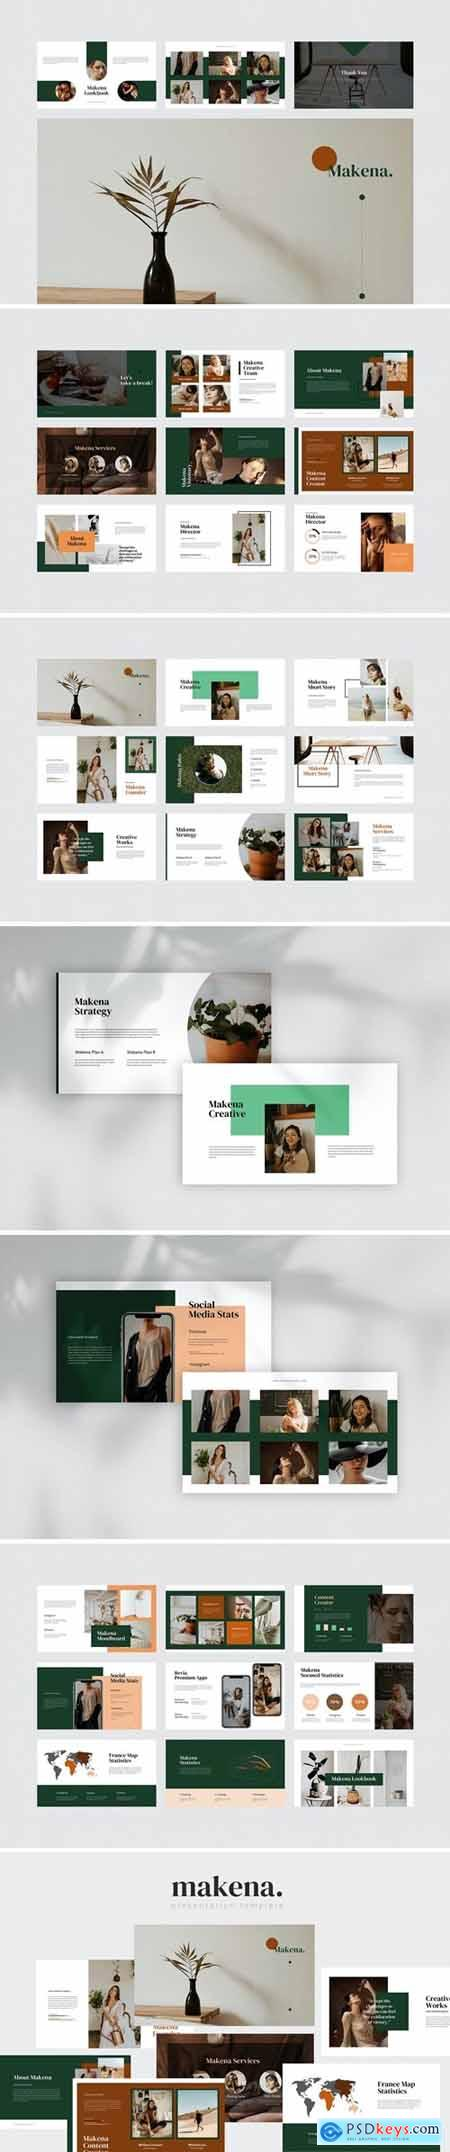 Makena - Creative Powerpoint Template